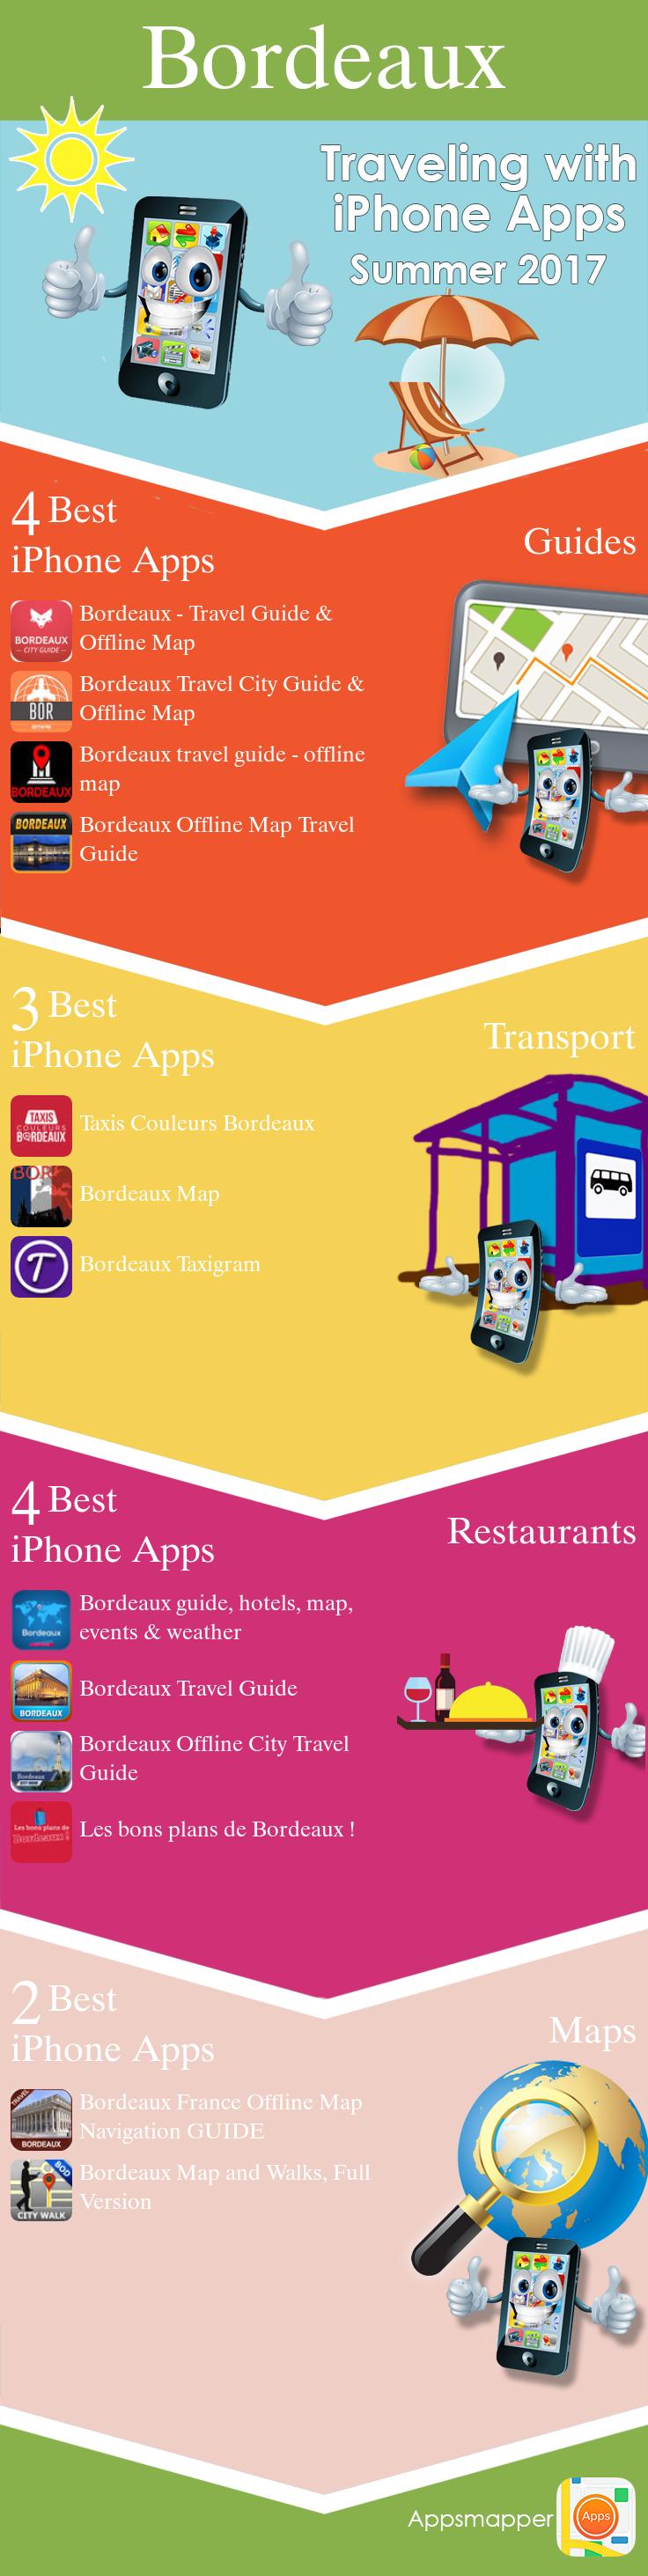 Bordeaux Iphone Apps Travel Guides Maps Transportation Biking